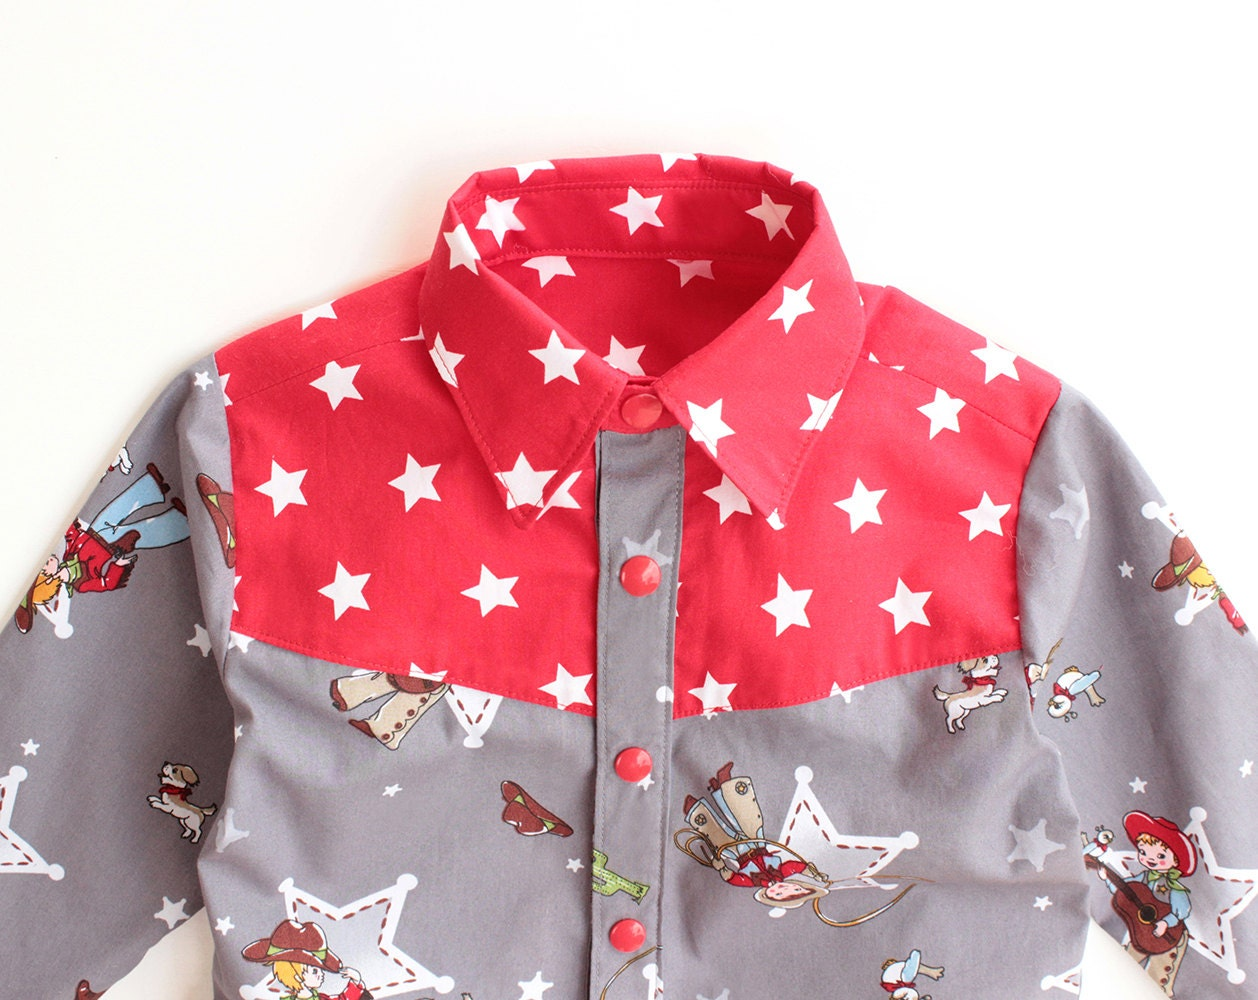 Toddler Sewing Patterns Simple Design